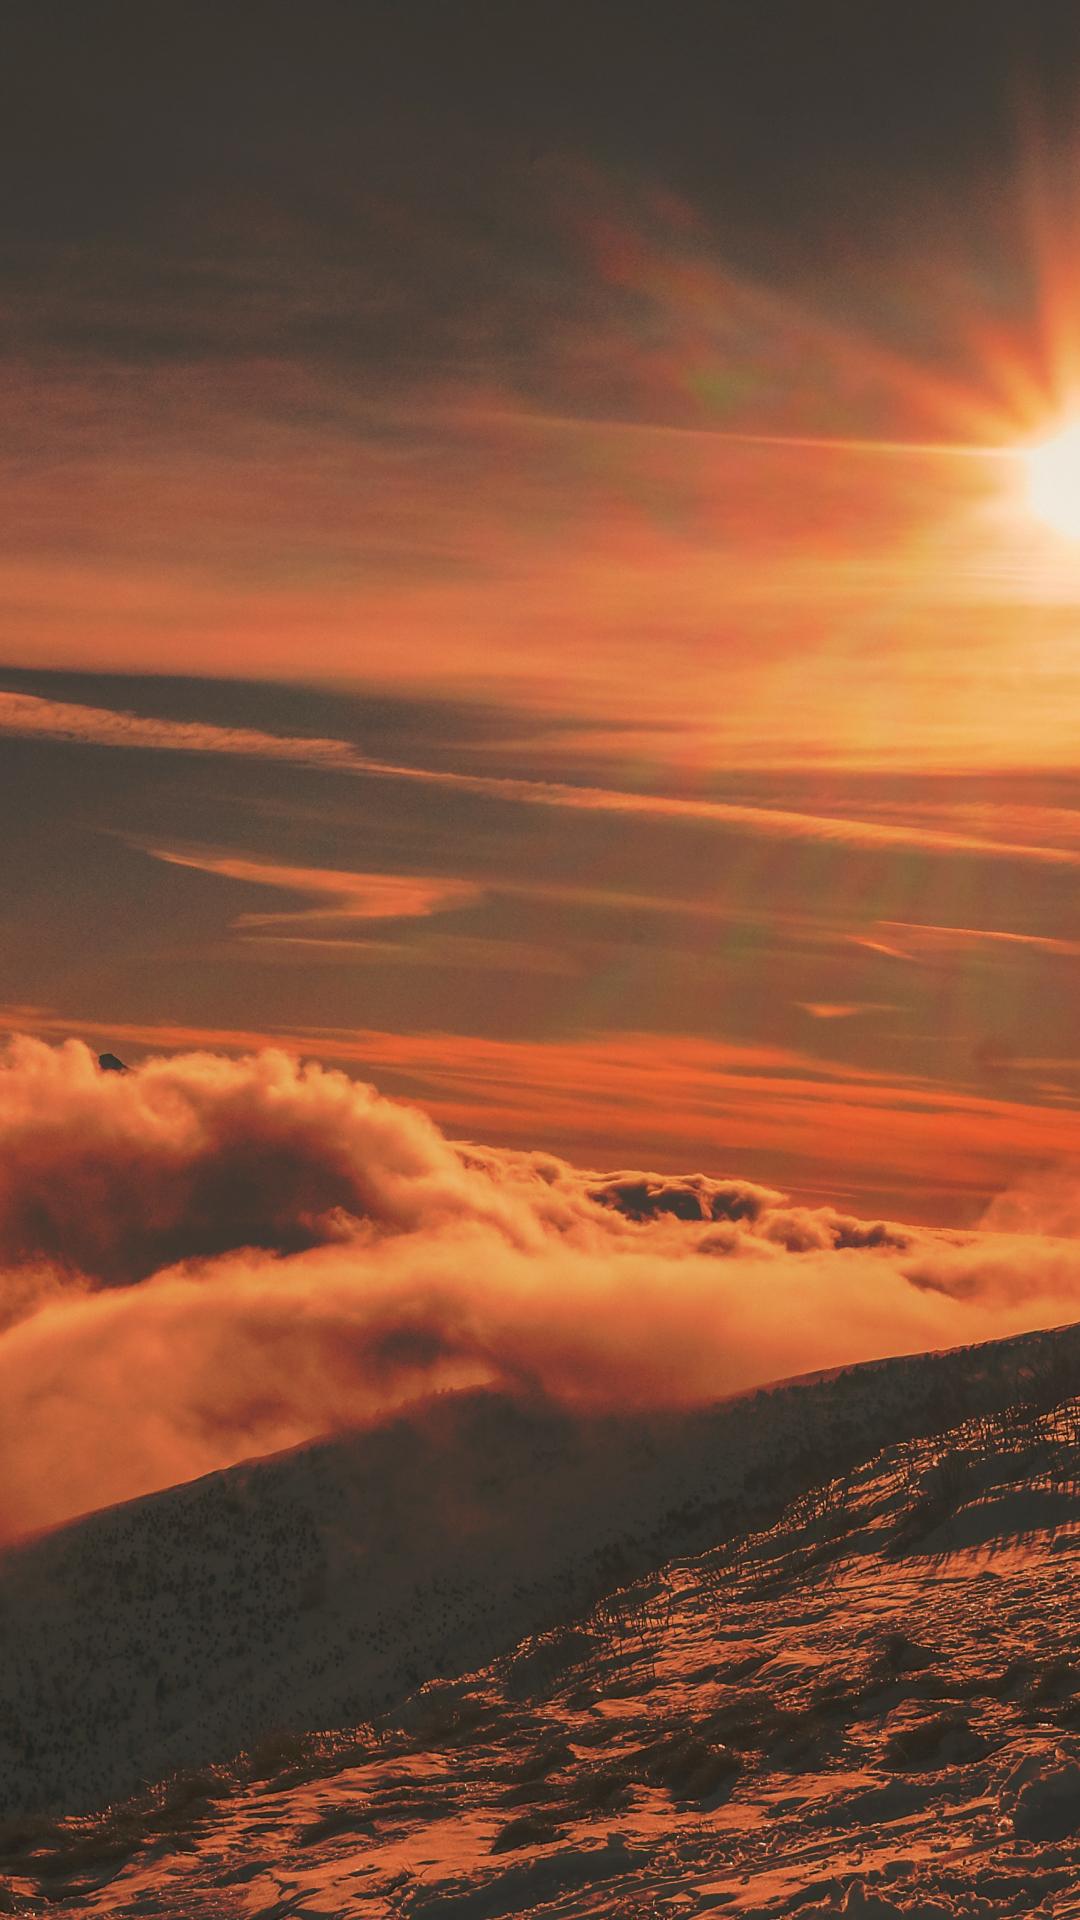 Sunset Sunrise Iphone Wallpaper Idrop News